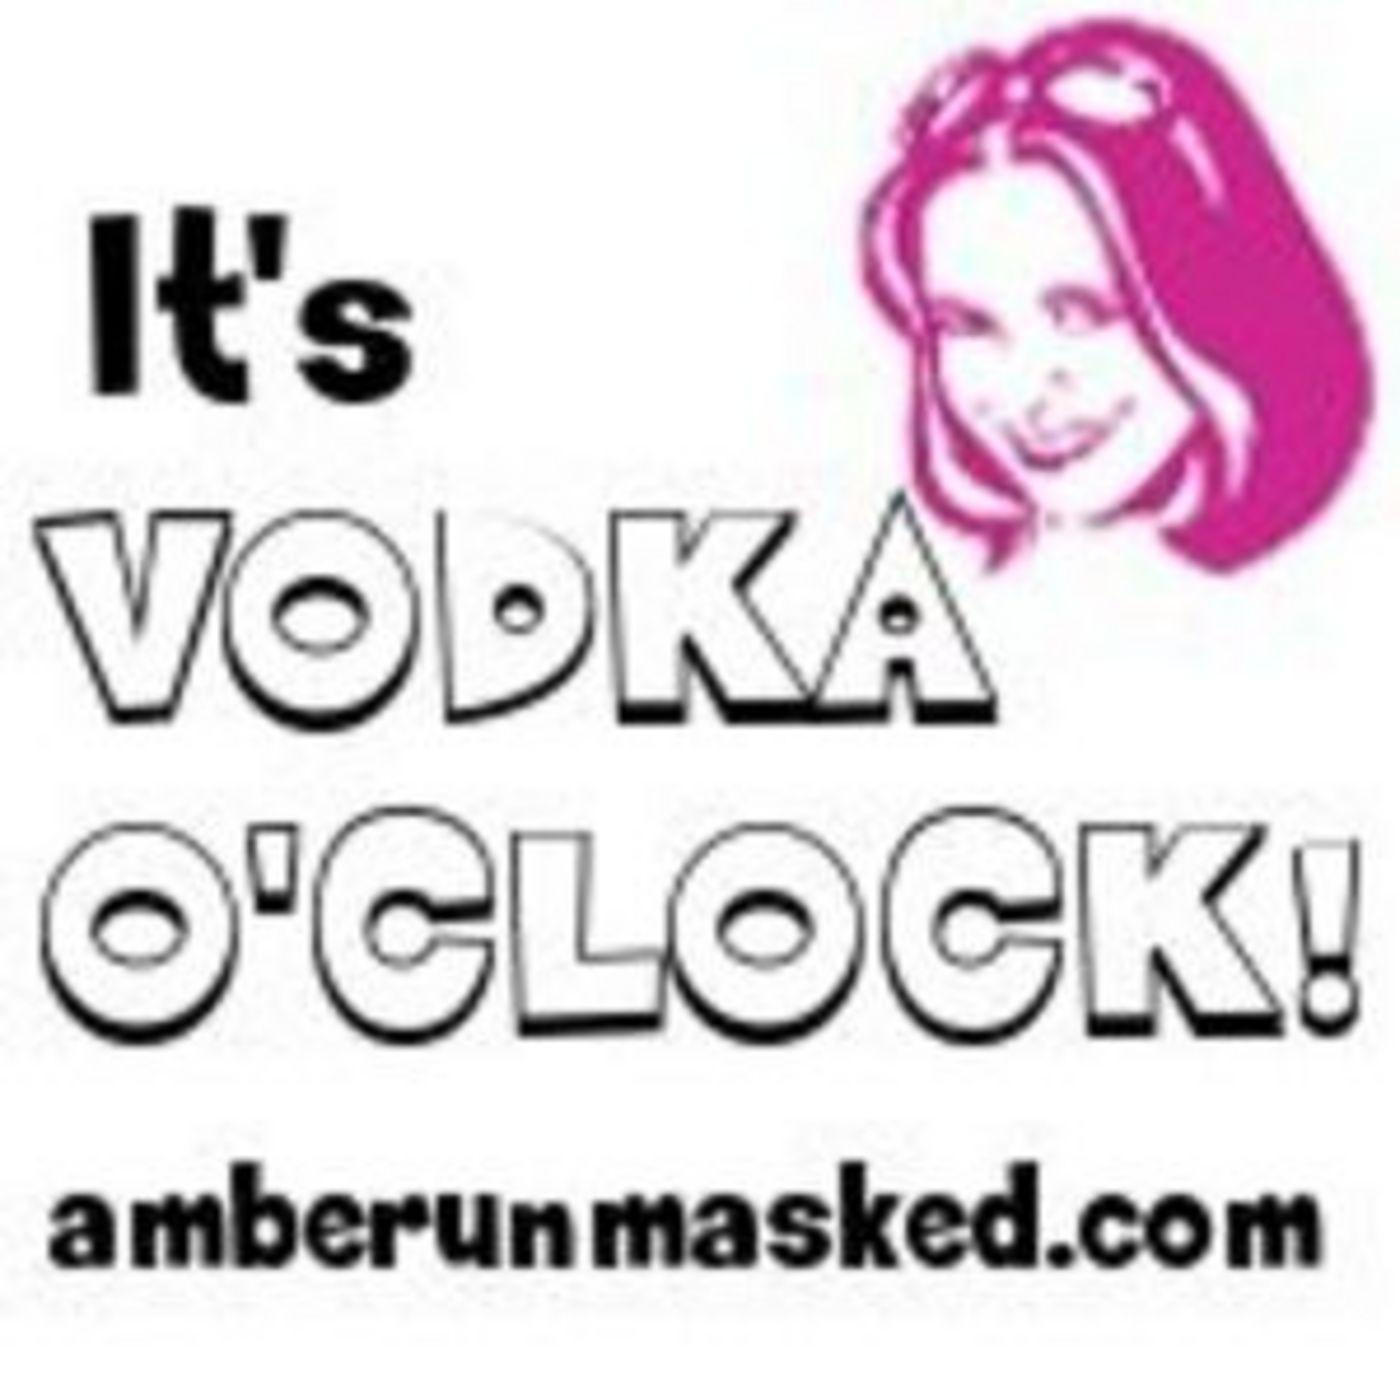 <![CDATA[VODKA O'CLOCK]]>